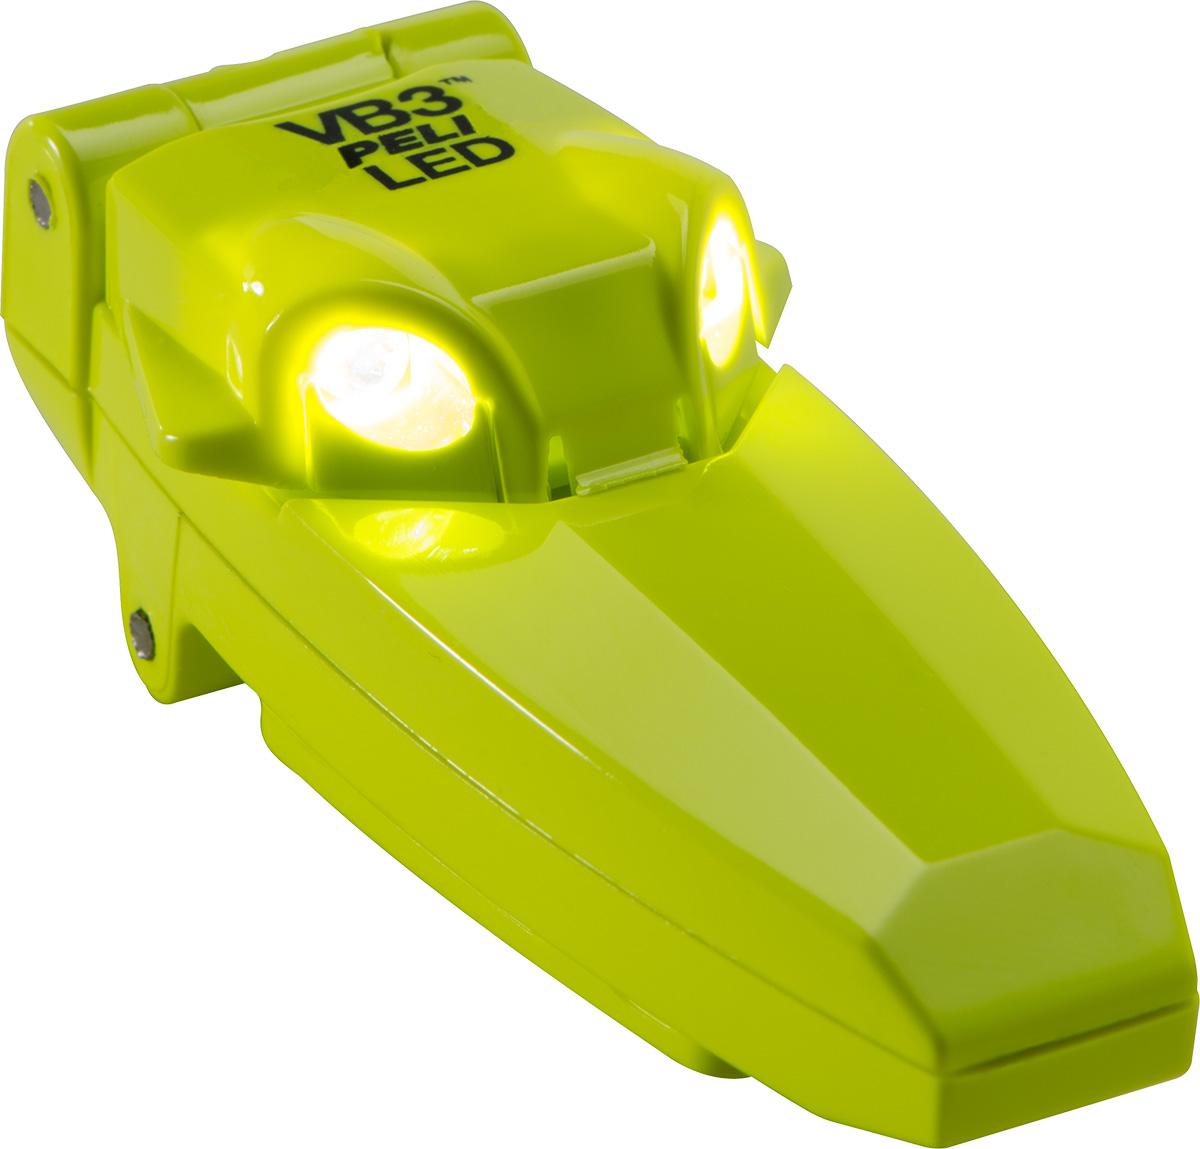 peli 2220 light zone 1 approved clip torch